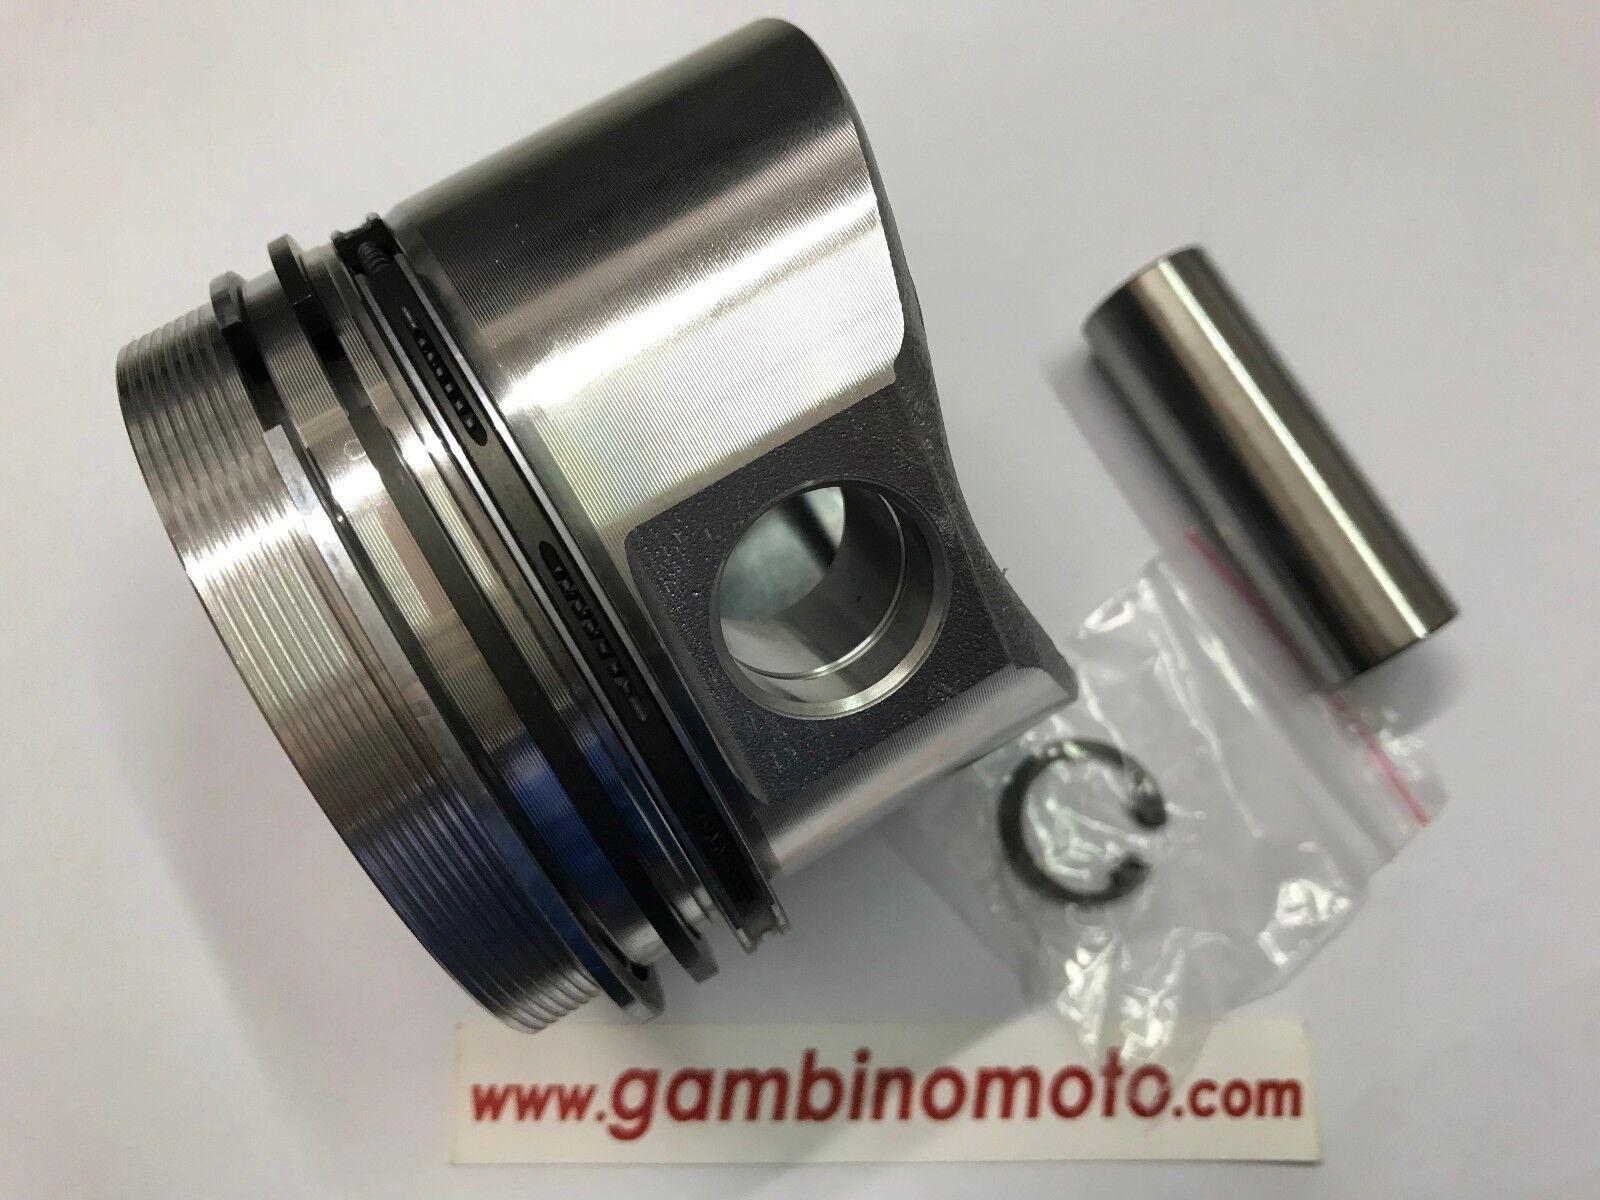 Kolben komplett für LOMBARDINI 15LD315 Durchmesser 78 3 Segmente Durchm. Bolzen